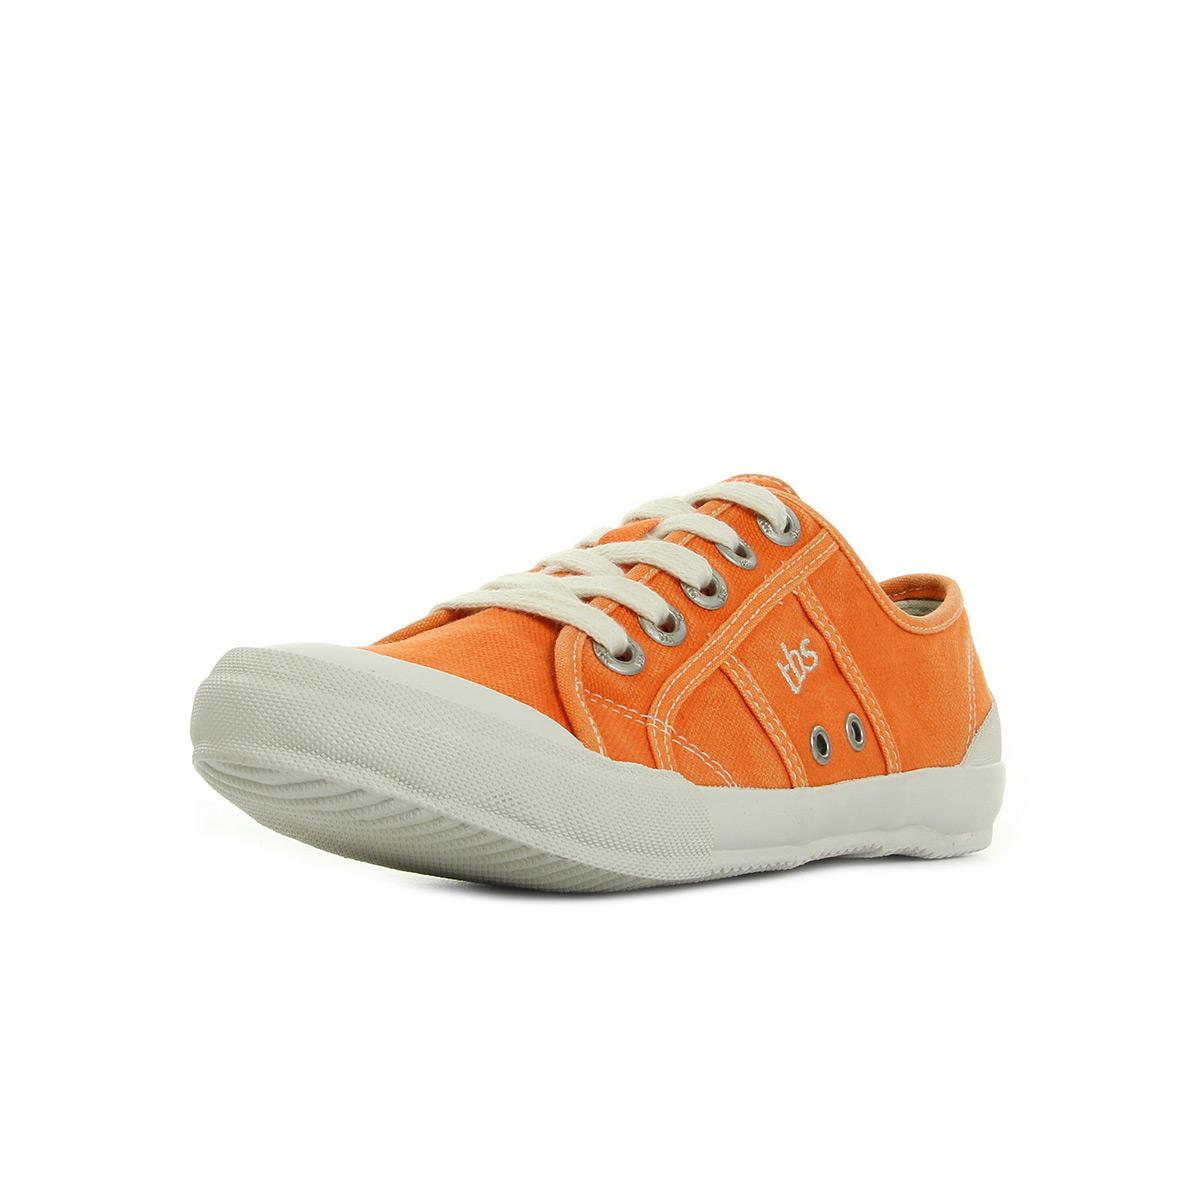 Baskets S7029orange Orange Femme Mode Opiace Tbs nFUxq7